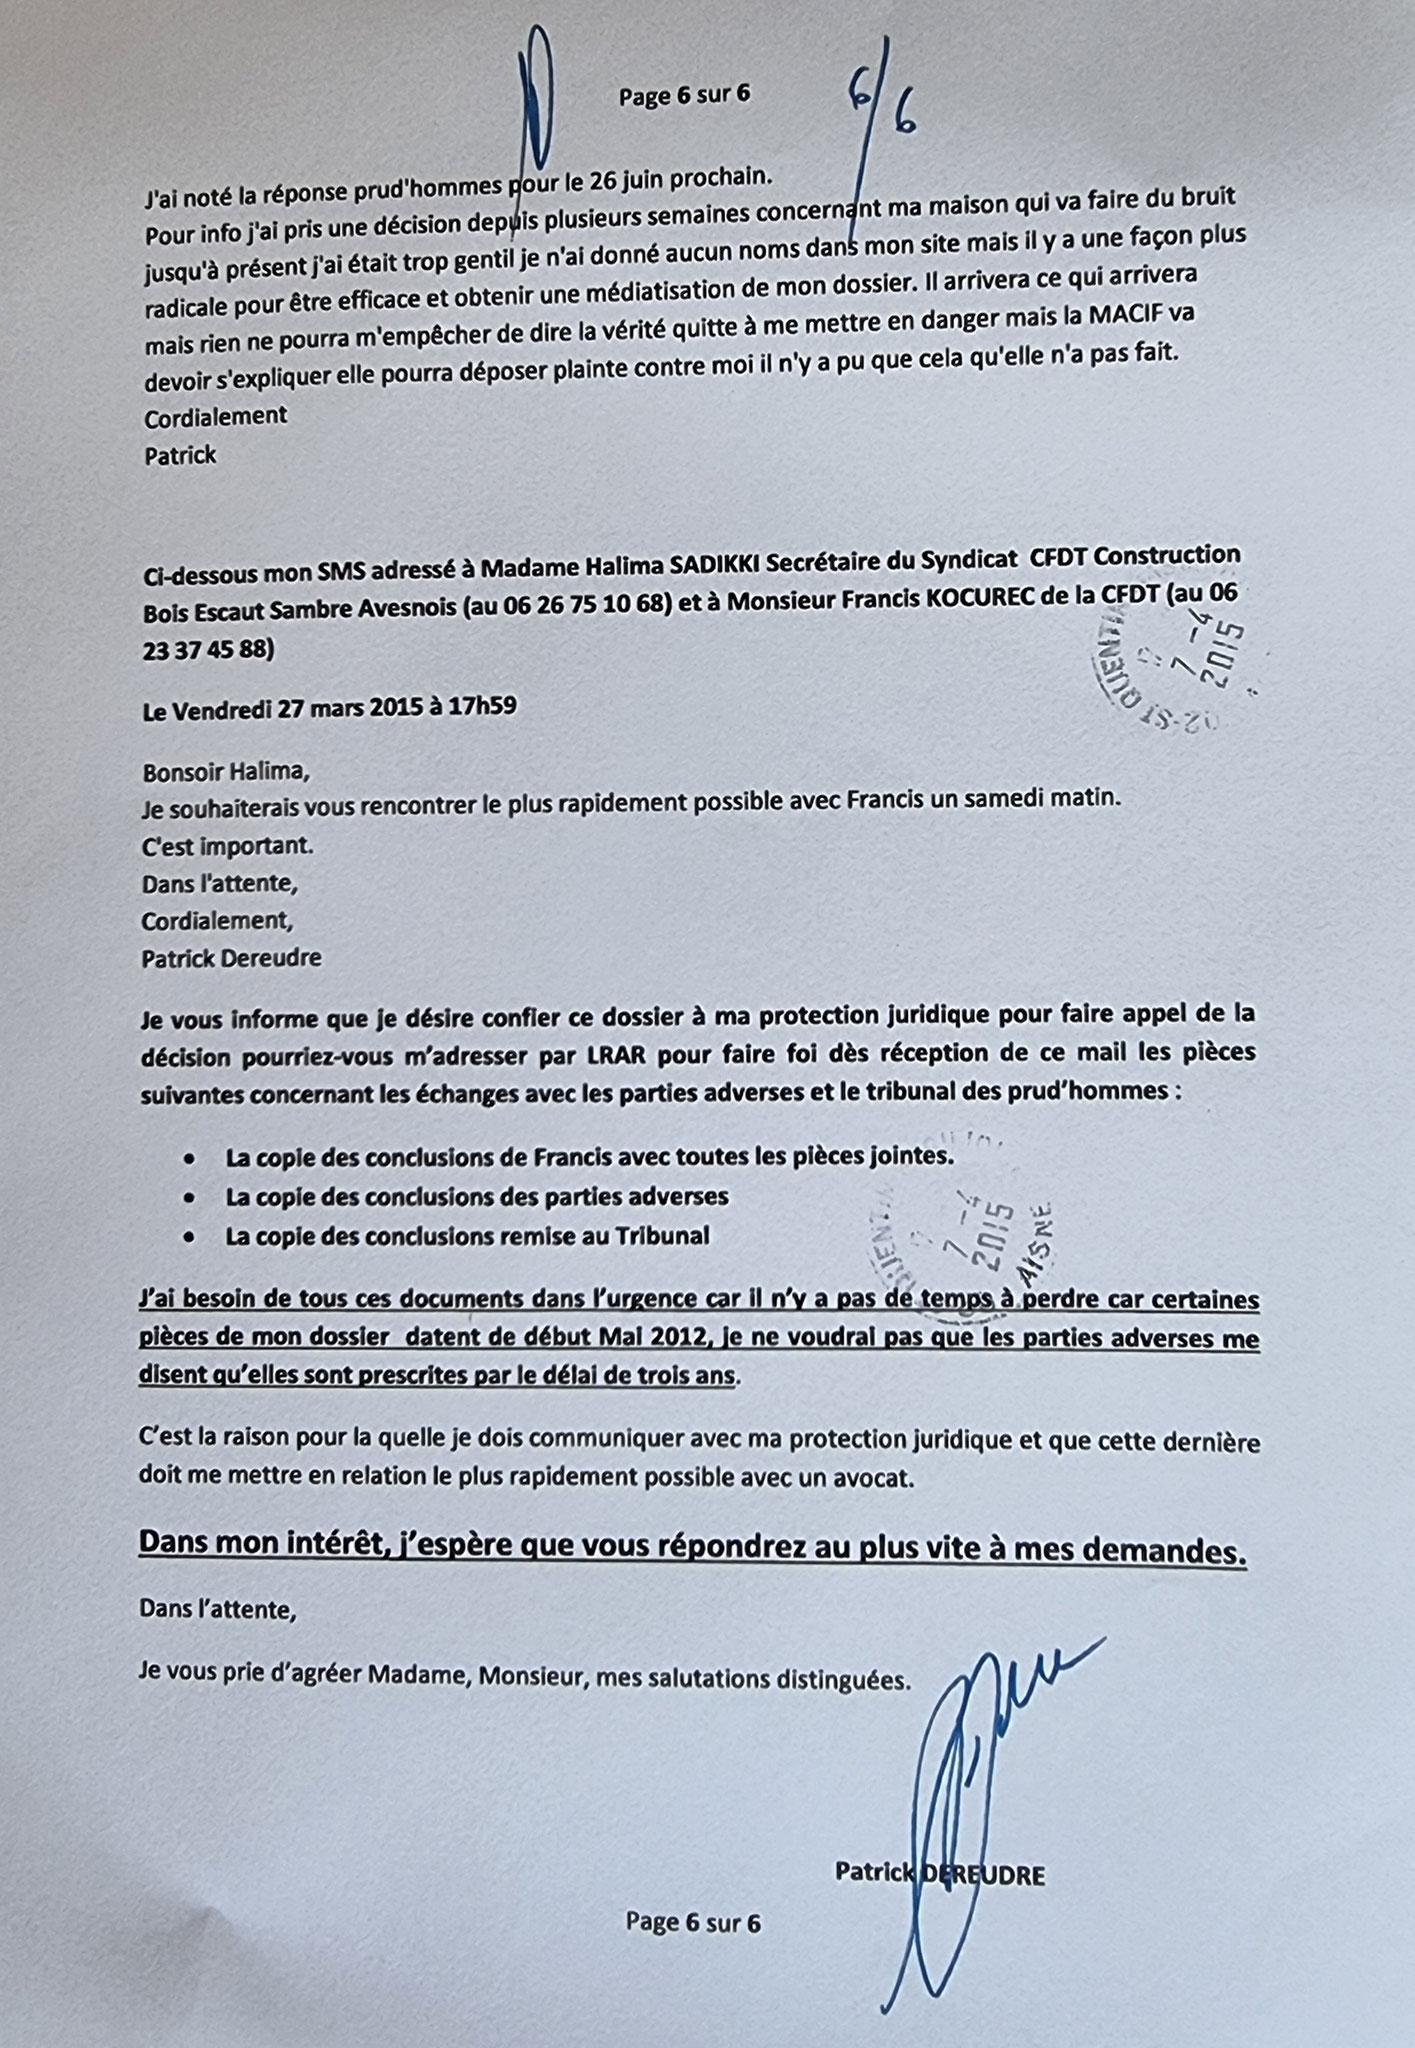 AFFAIRE CFDT Une énorme TROMPERIE, MANIPULATION #StopCorruption #StopTorturesMentales #StopViolences www.jenesuispasunchien.fr www.jesuispatrick.fr www.jesuisvictime.fr